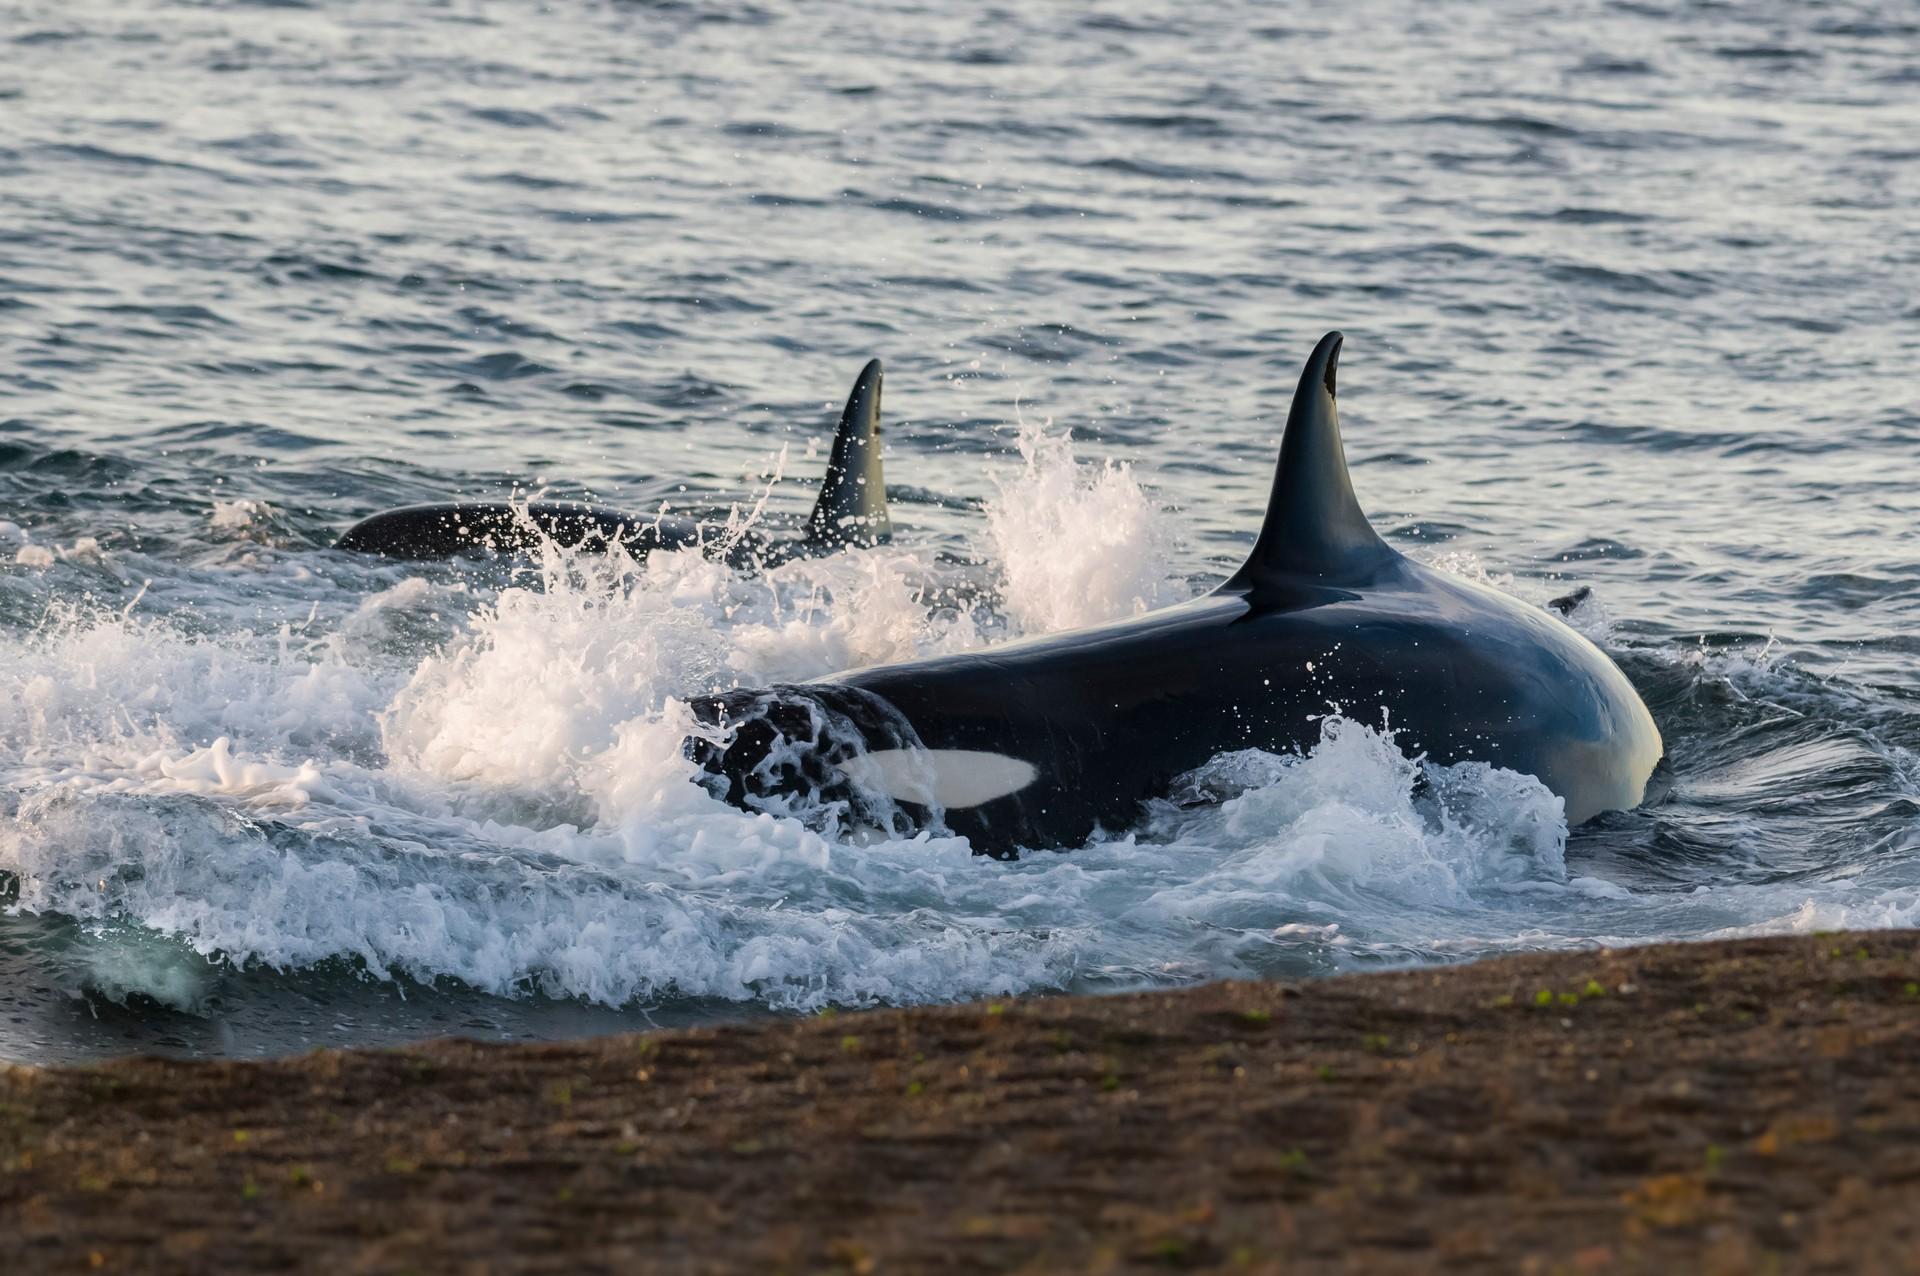 Orcas hunting in Peninsula Valdes, Patagonia